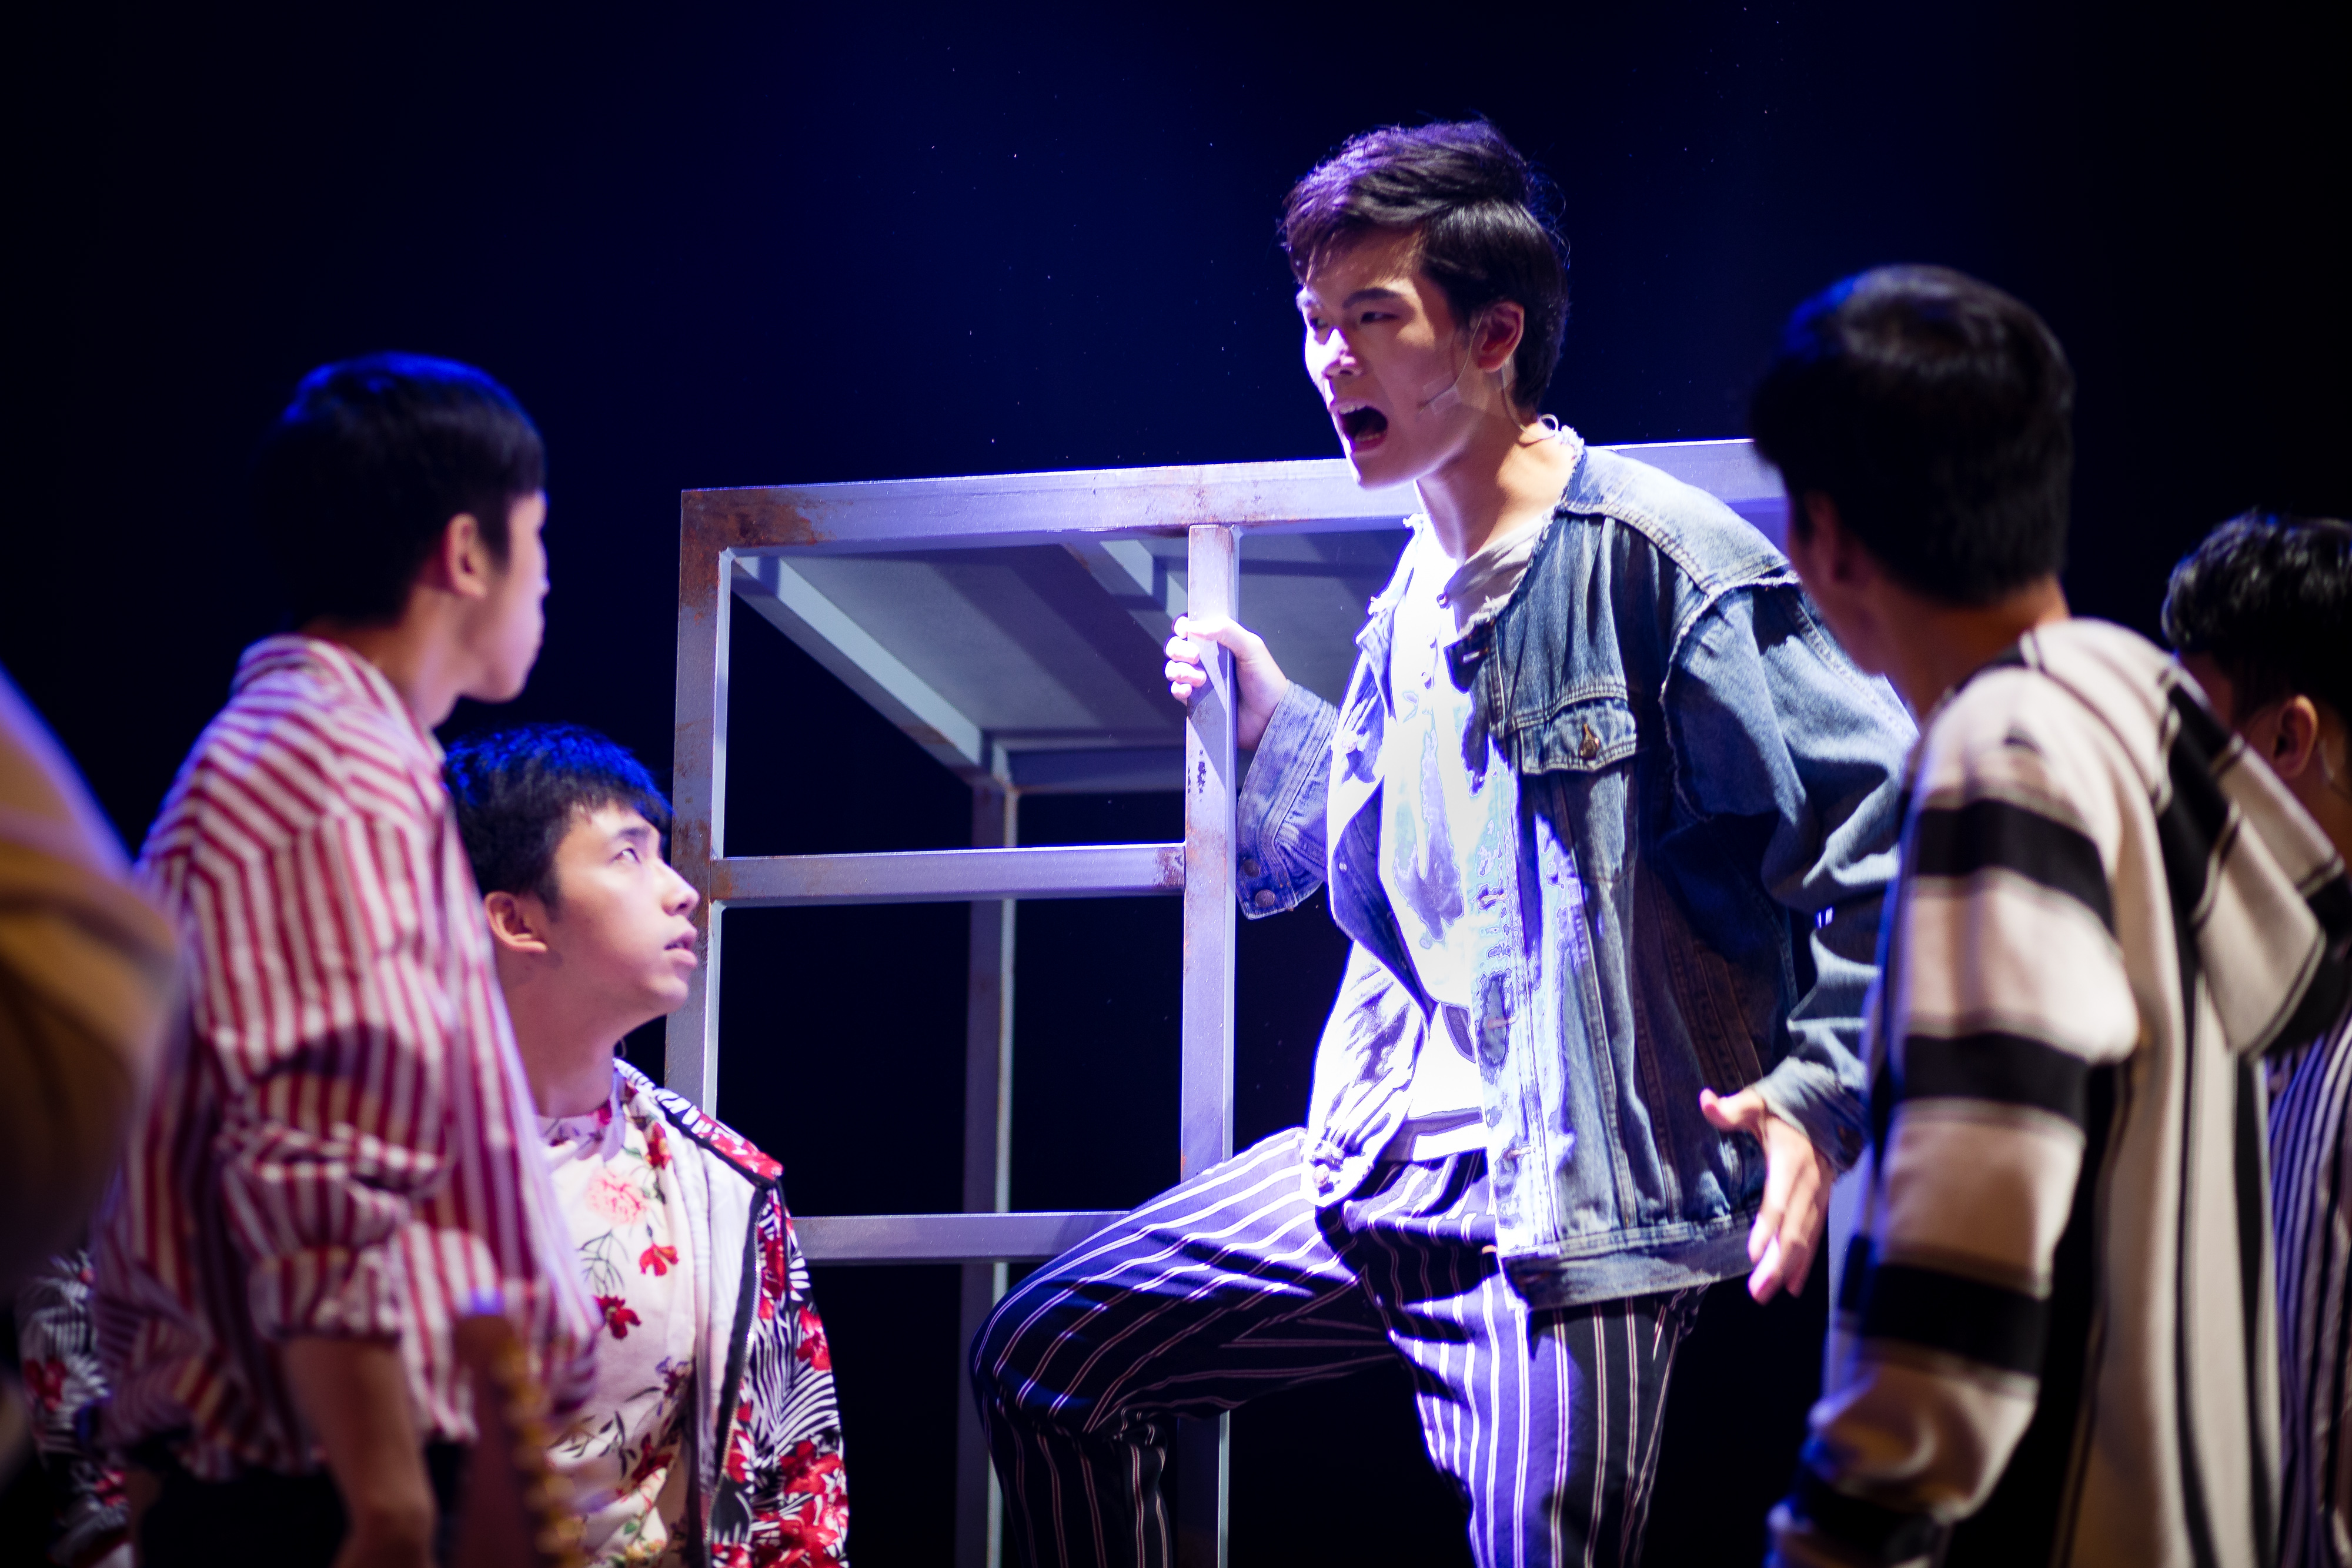 Rent/類別:RENT、演出/攝影:艾浩家/(天台製作 • 香港專業劇團)